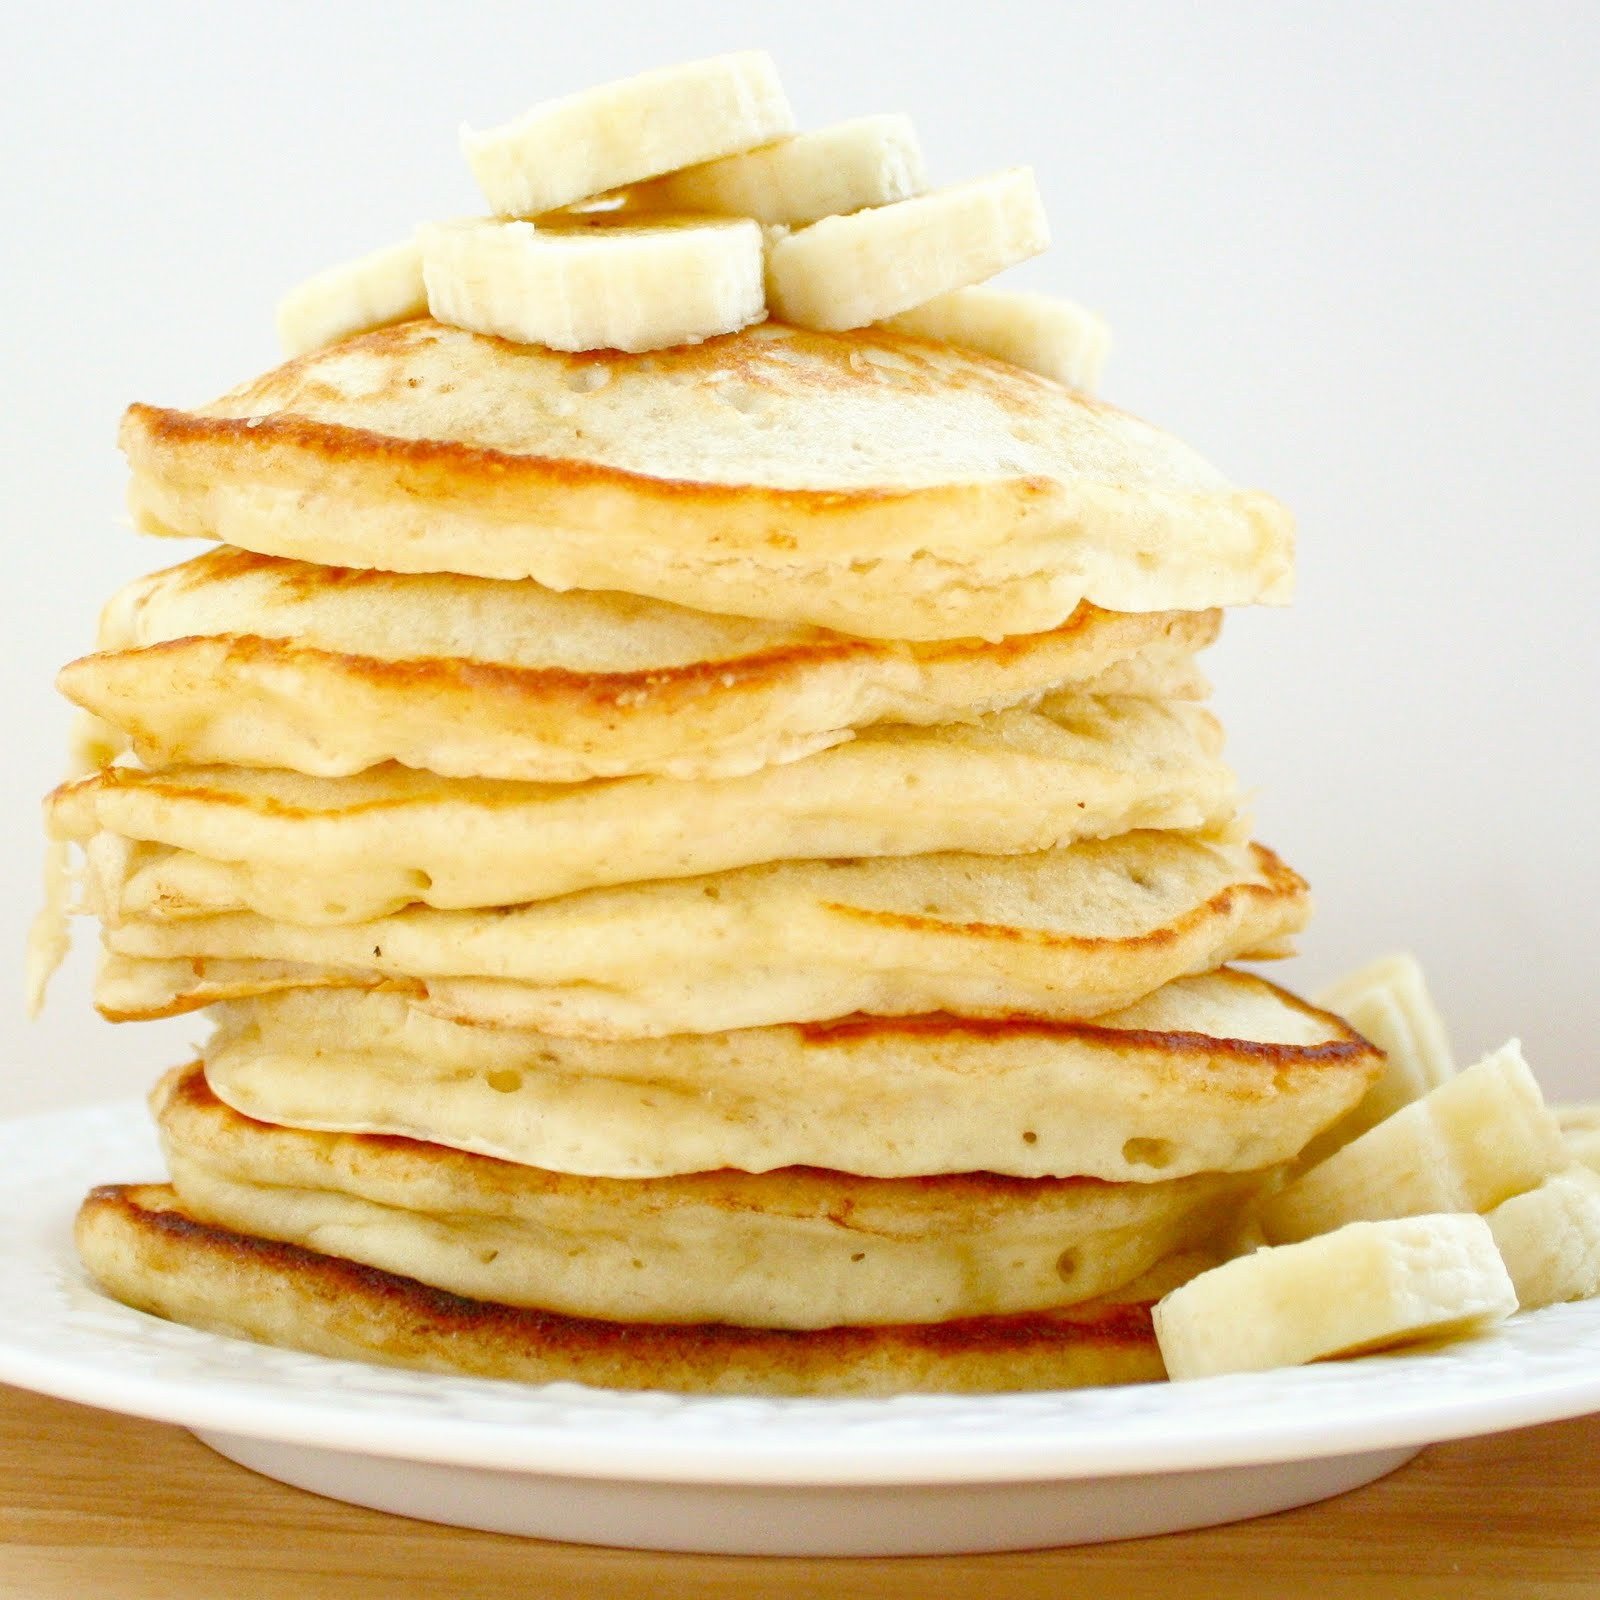 A Bitchin' Kitchen: Banana Pancakes